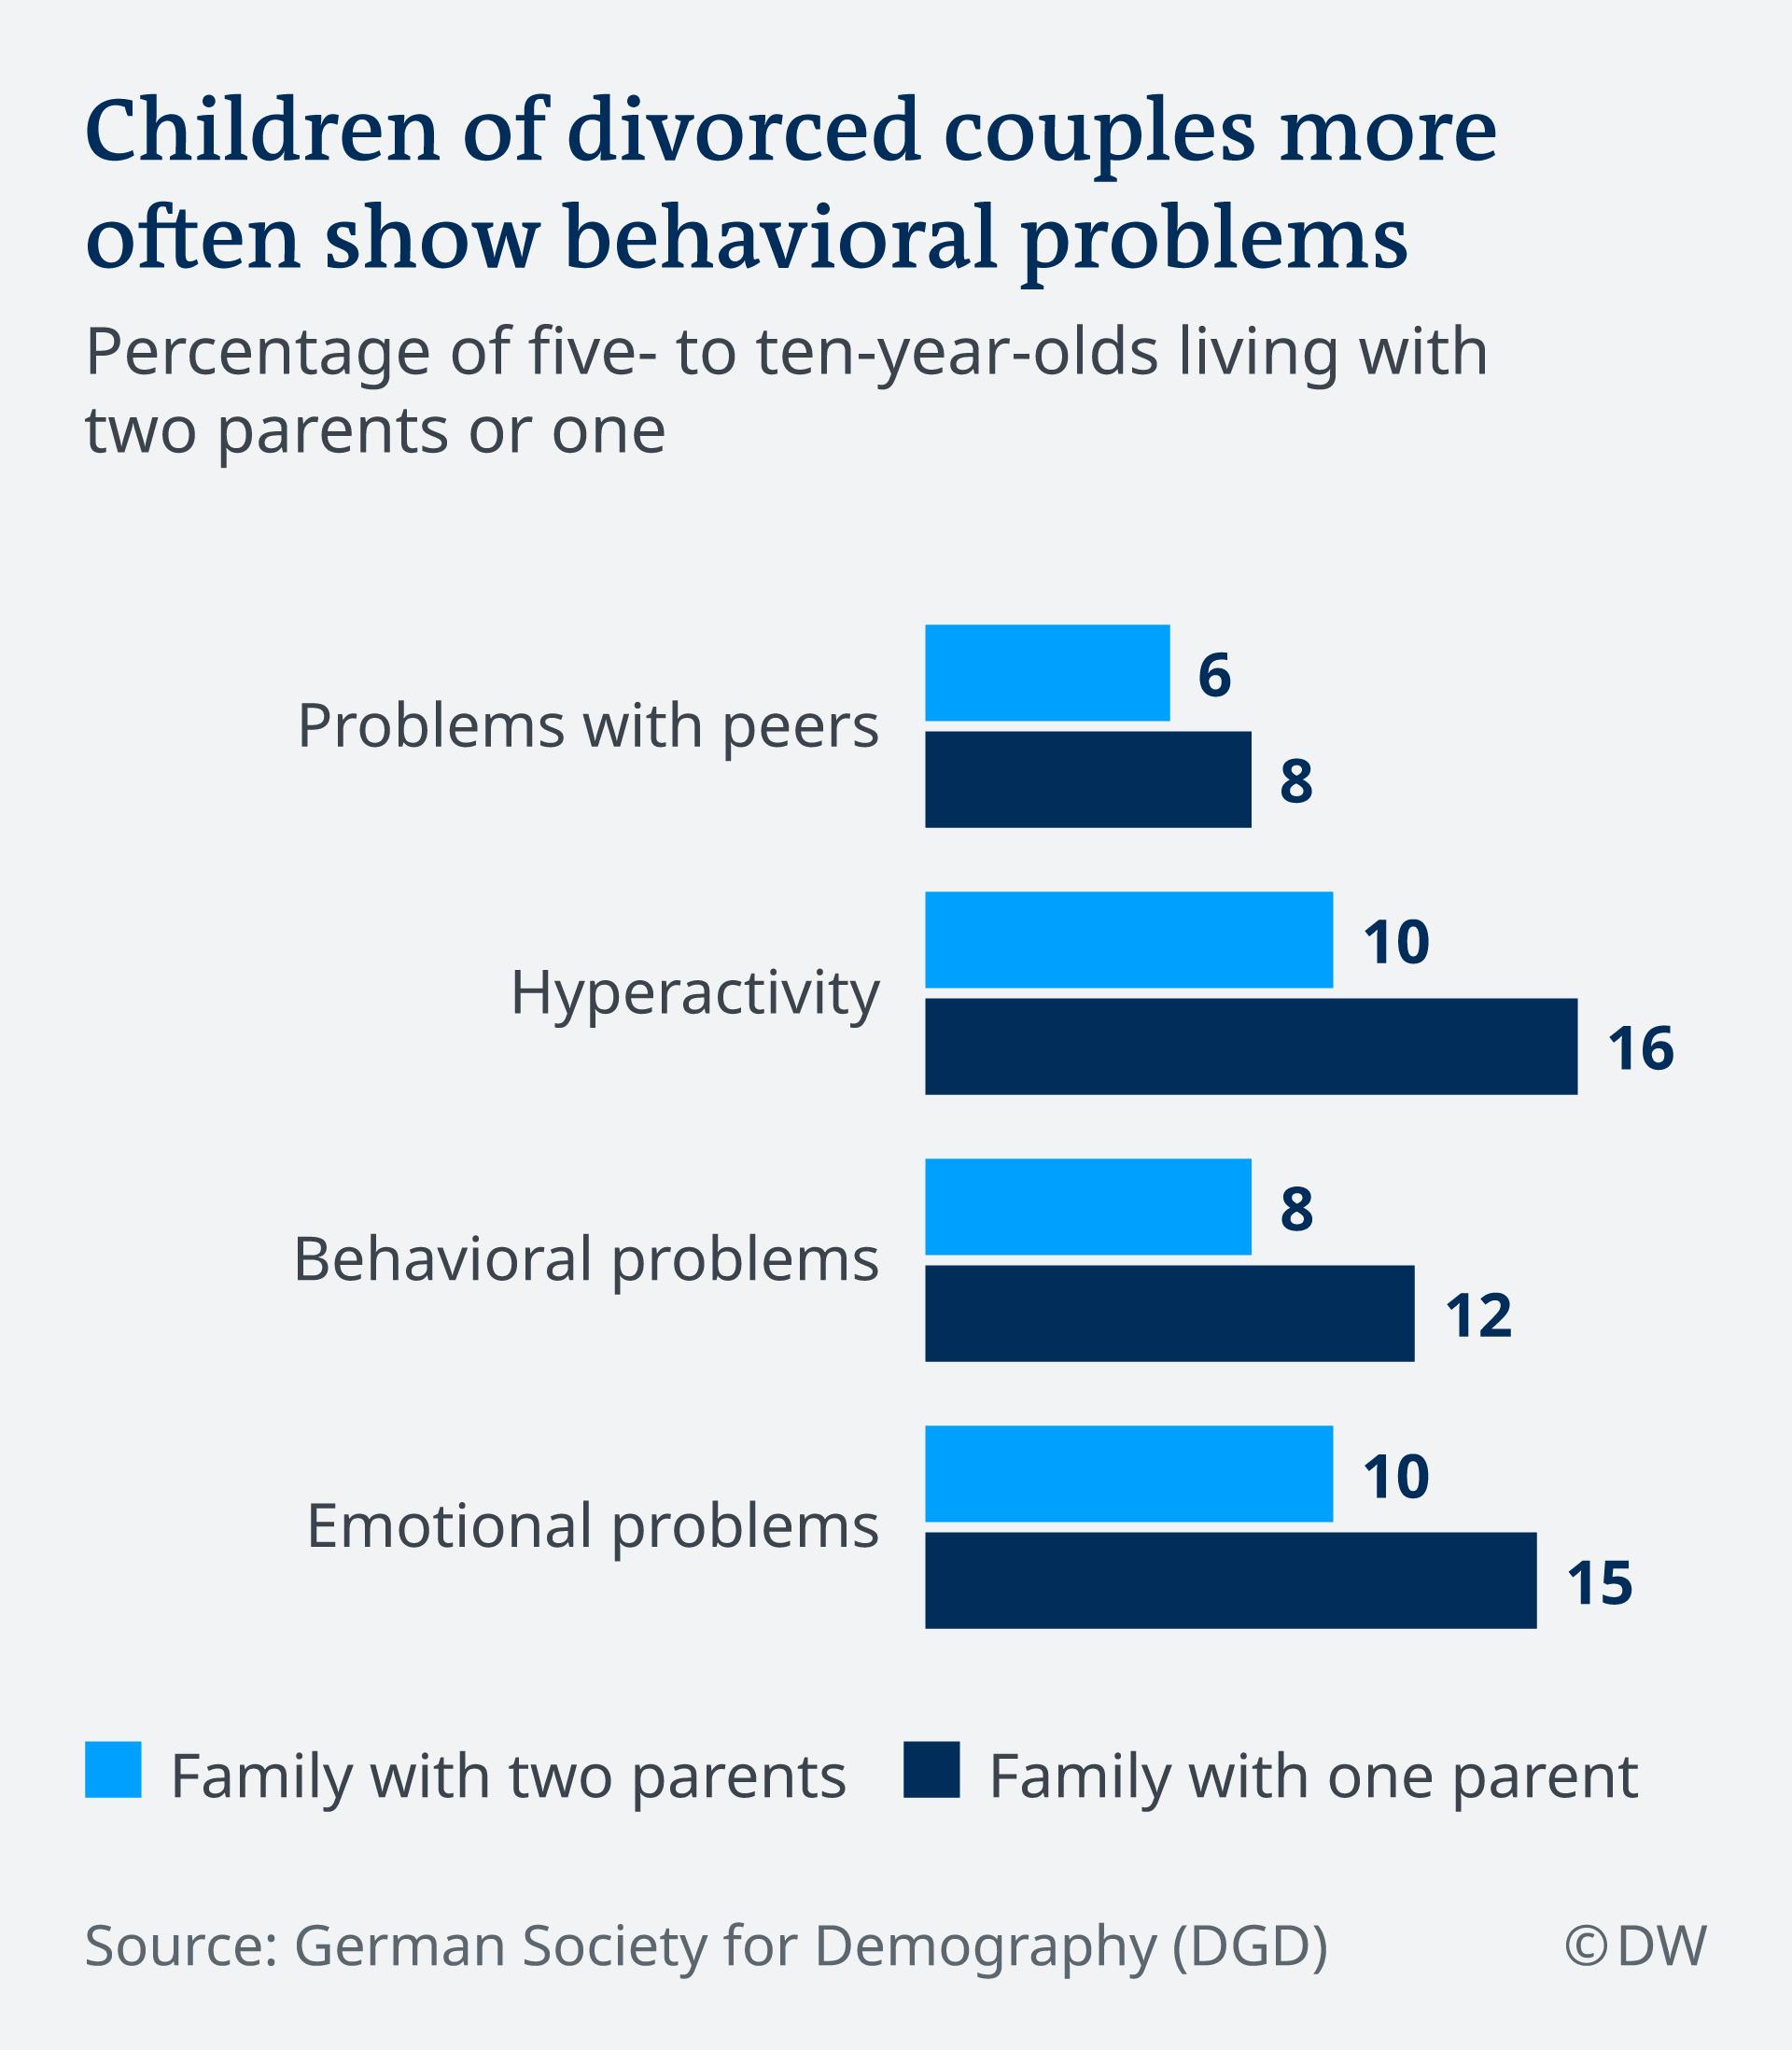 Infographic: Children of divorces couples more often show behavioral problems